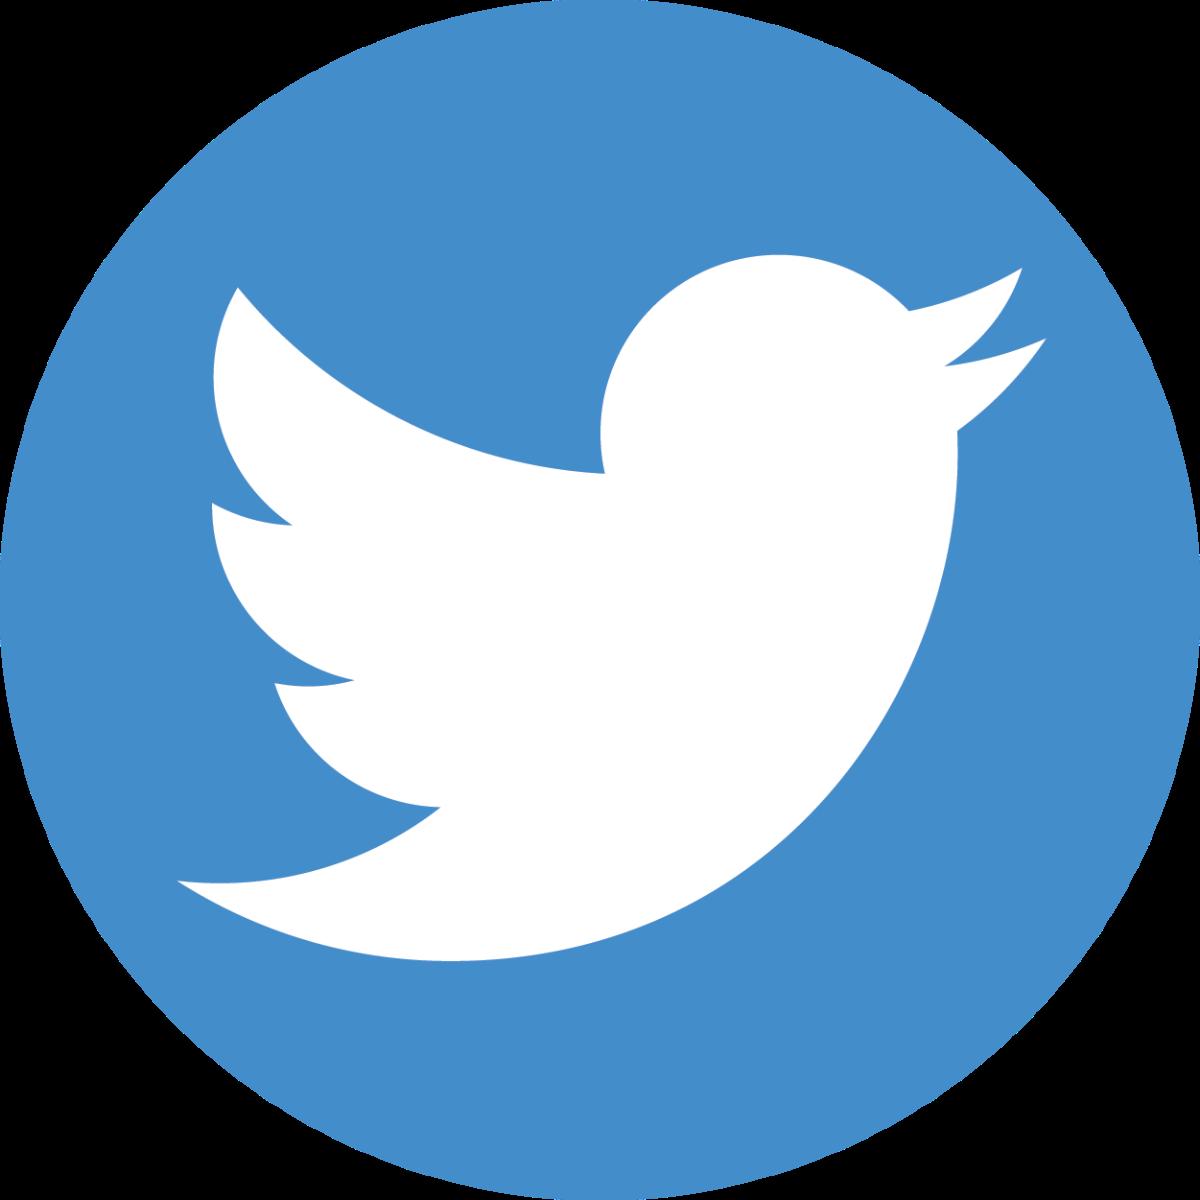 Insignia Twitter